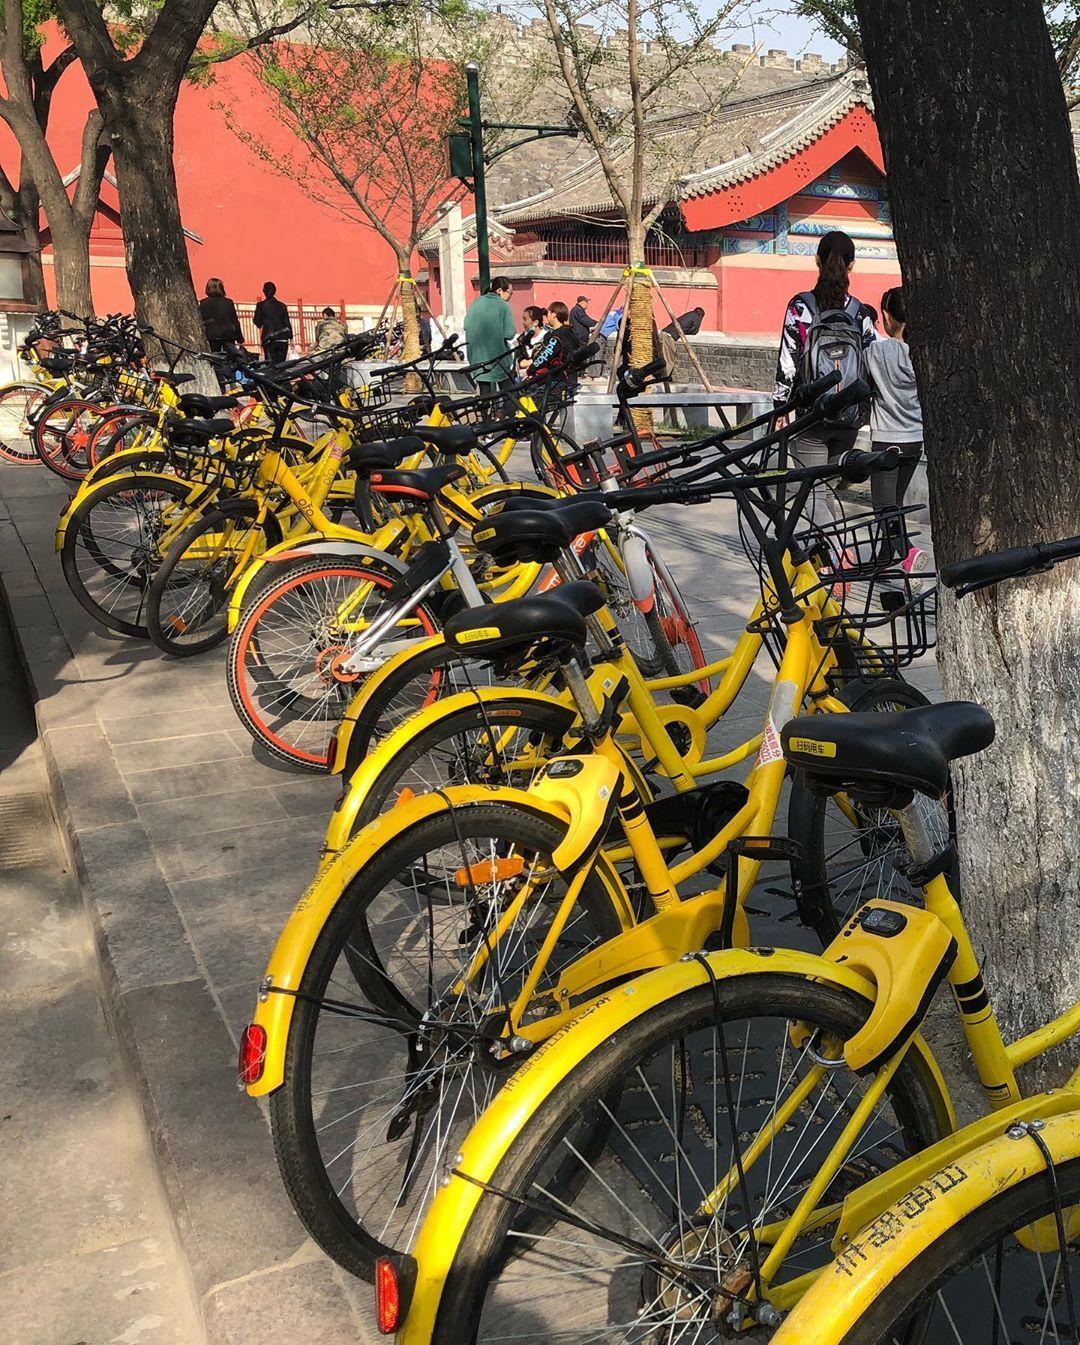 Take me back  Yellow heaven  #china #travel #beijing #enjoy #enjoylife #happy #adventure  Take me back  Yellow heaven  #china #travel #beijing #enjoy #enjoylife #happy #adventure #adventuretime #yellow #live #freedom #fullofjoy